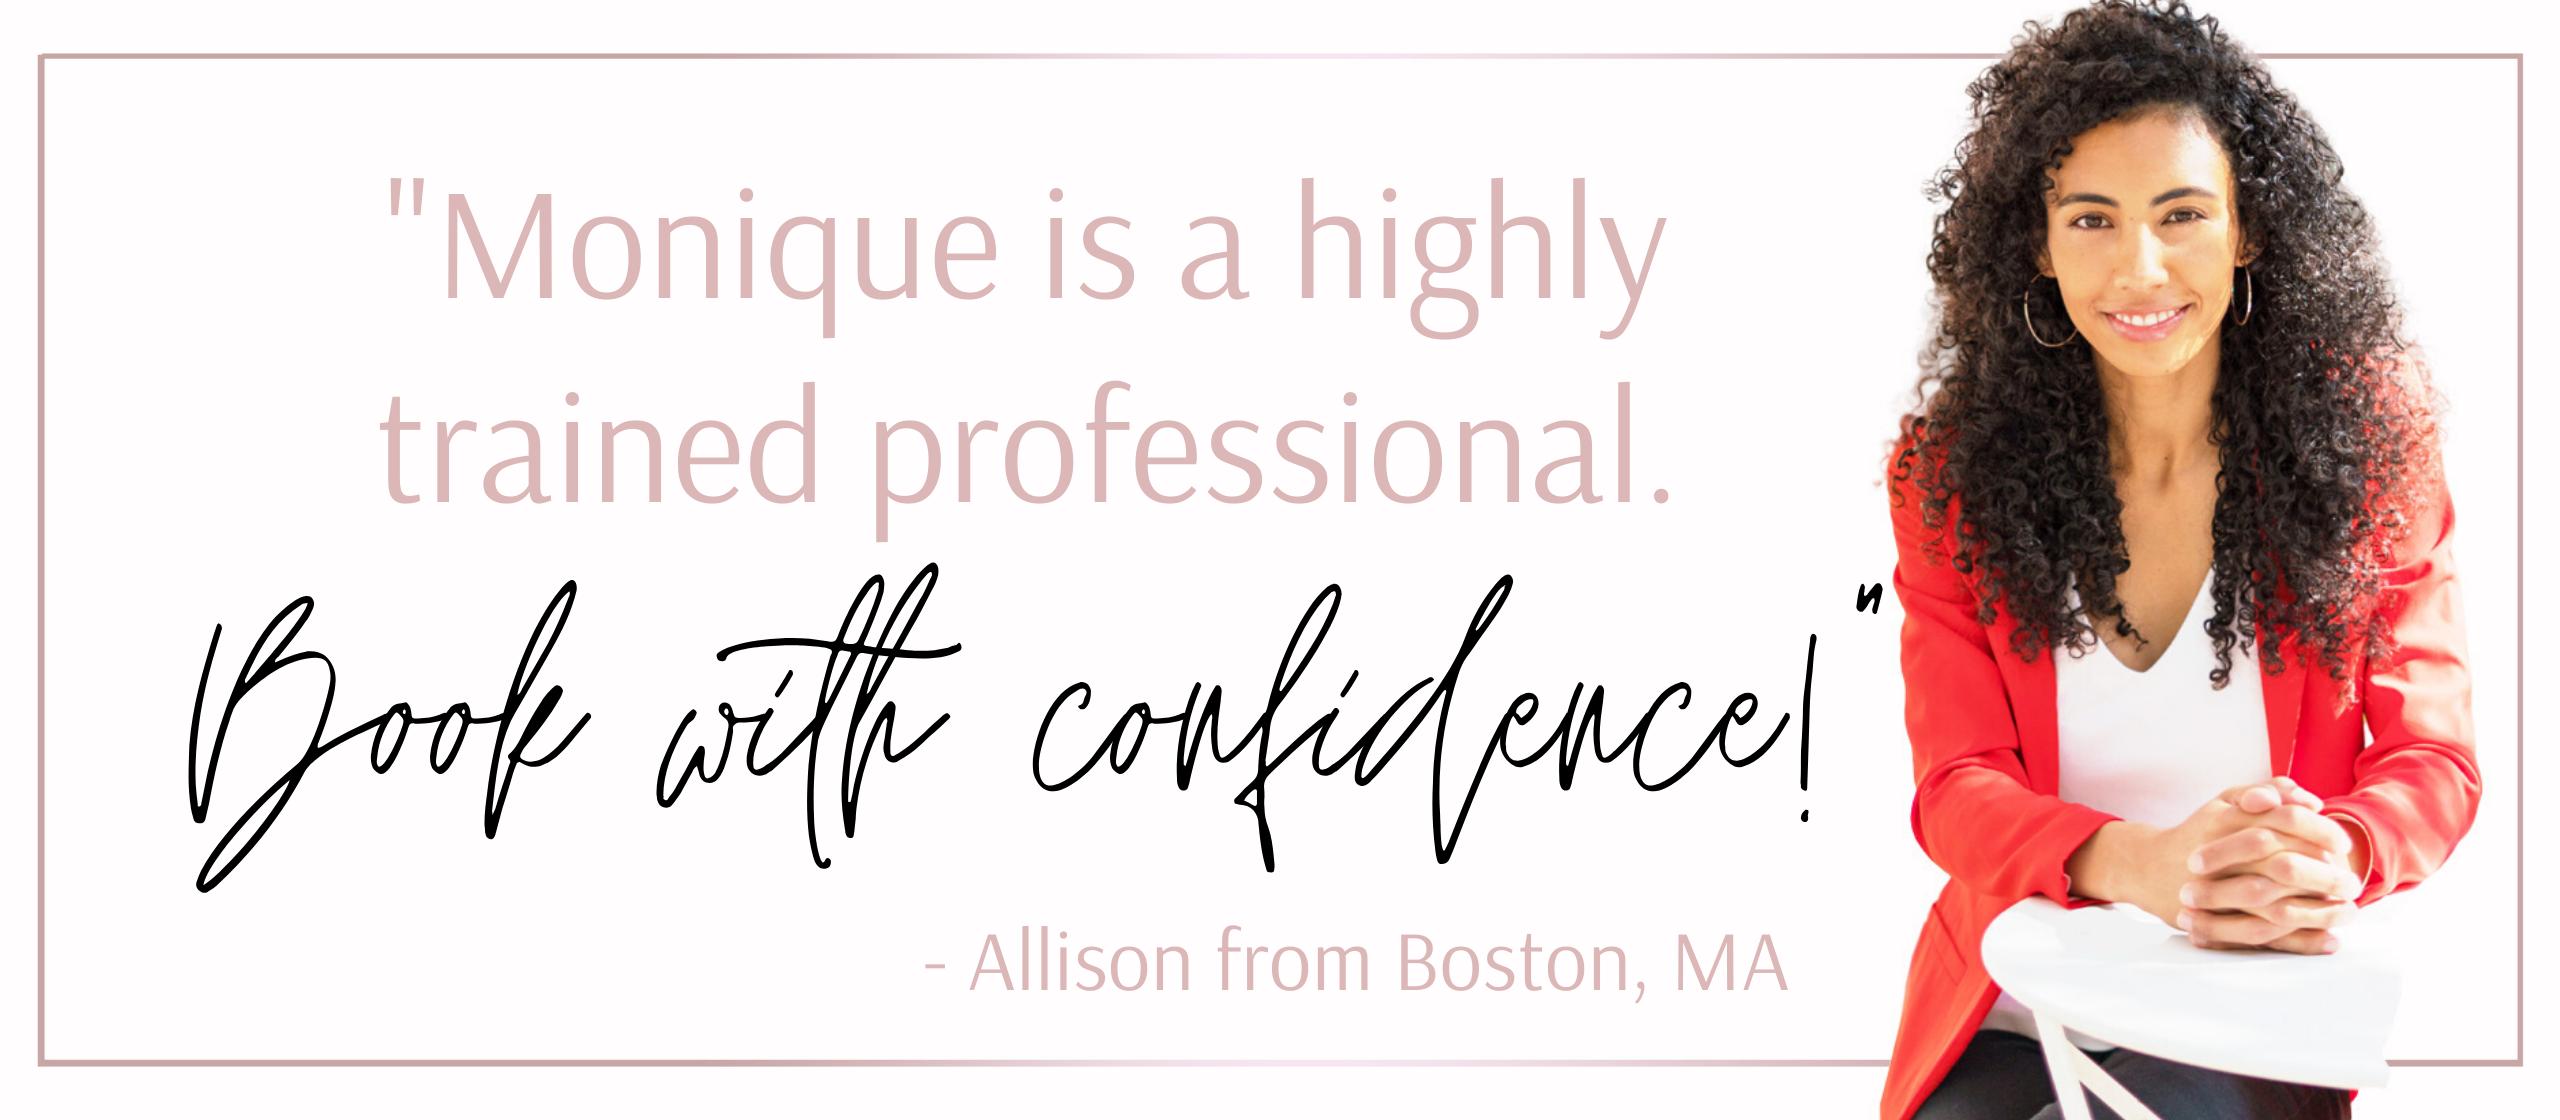 - Allison from Boston, MA